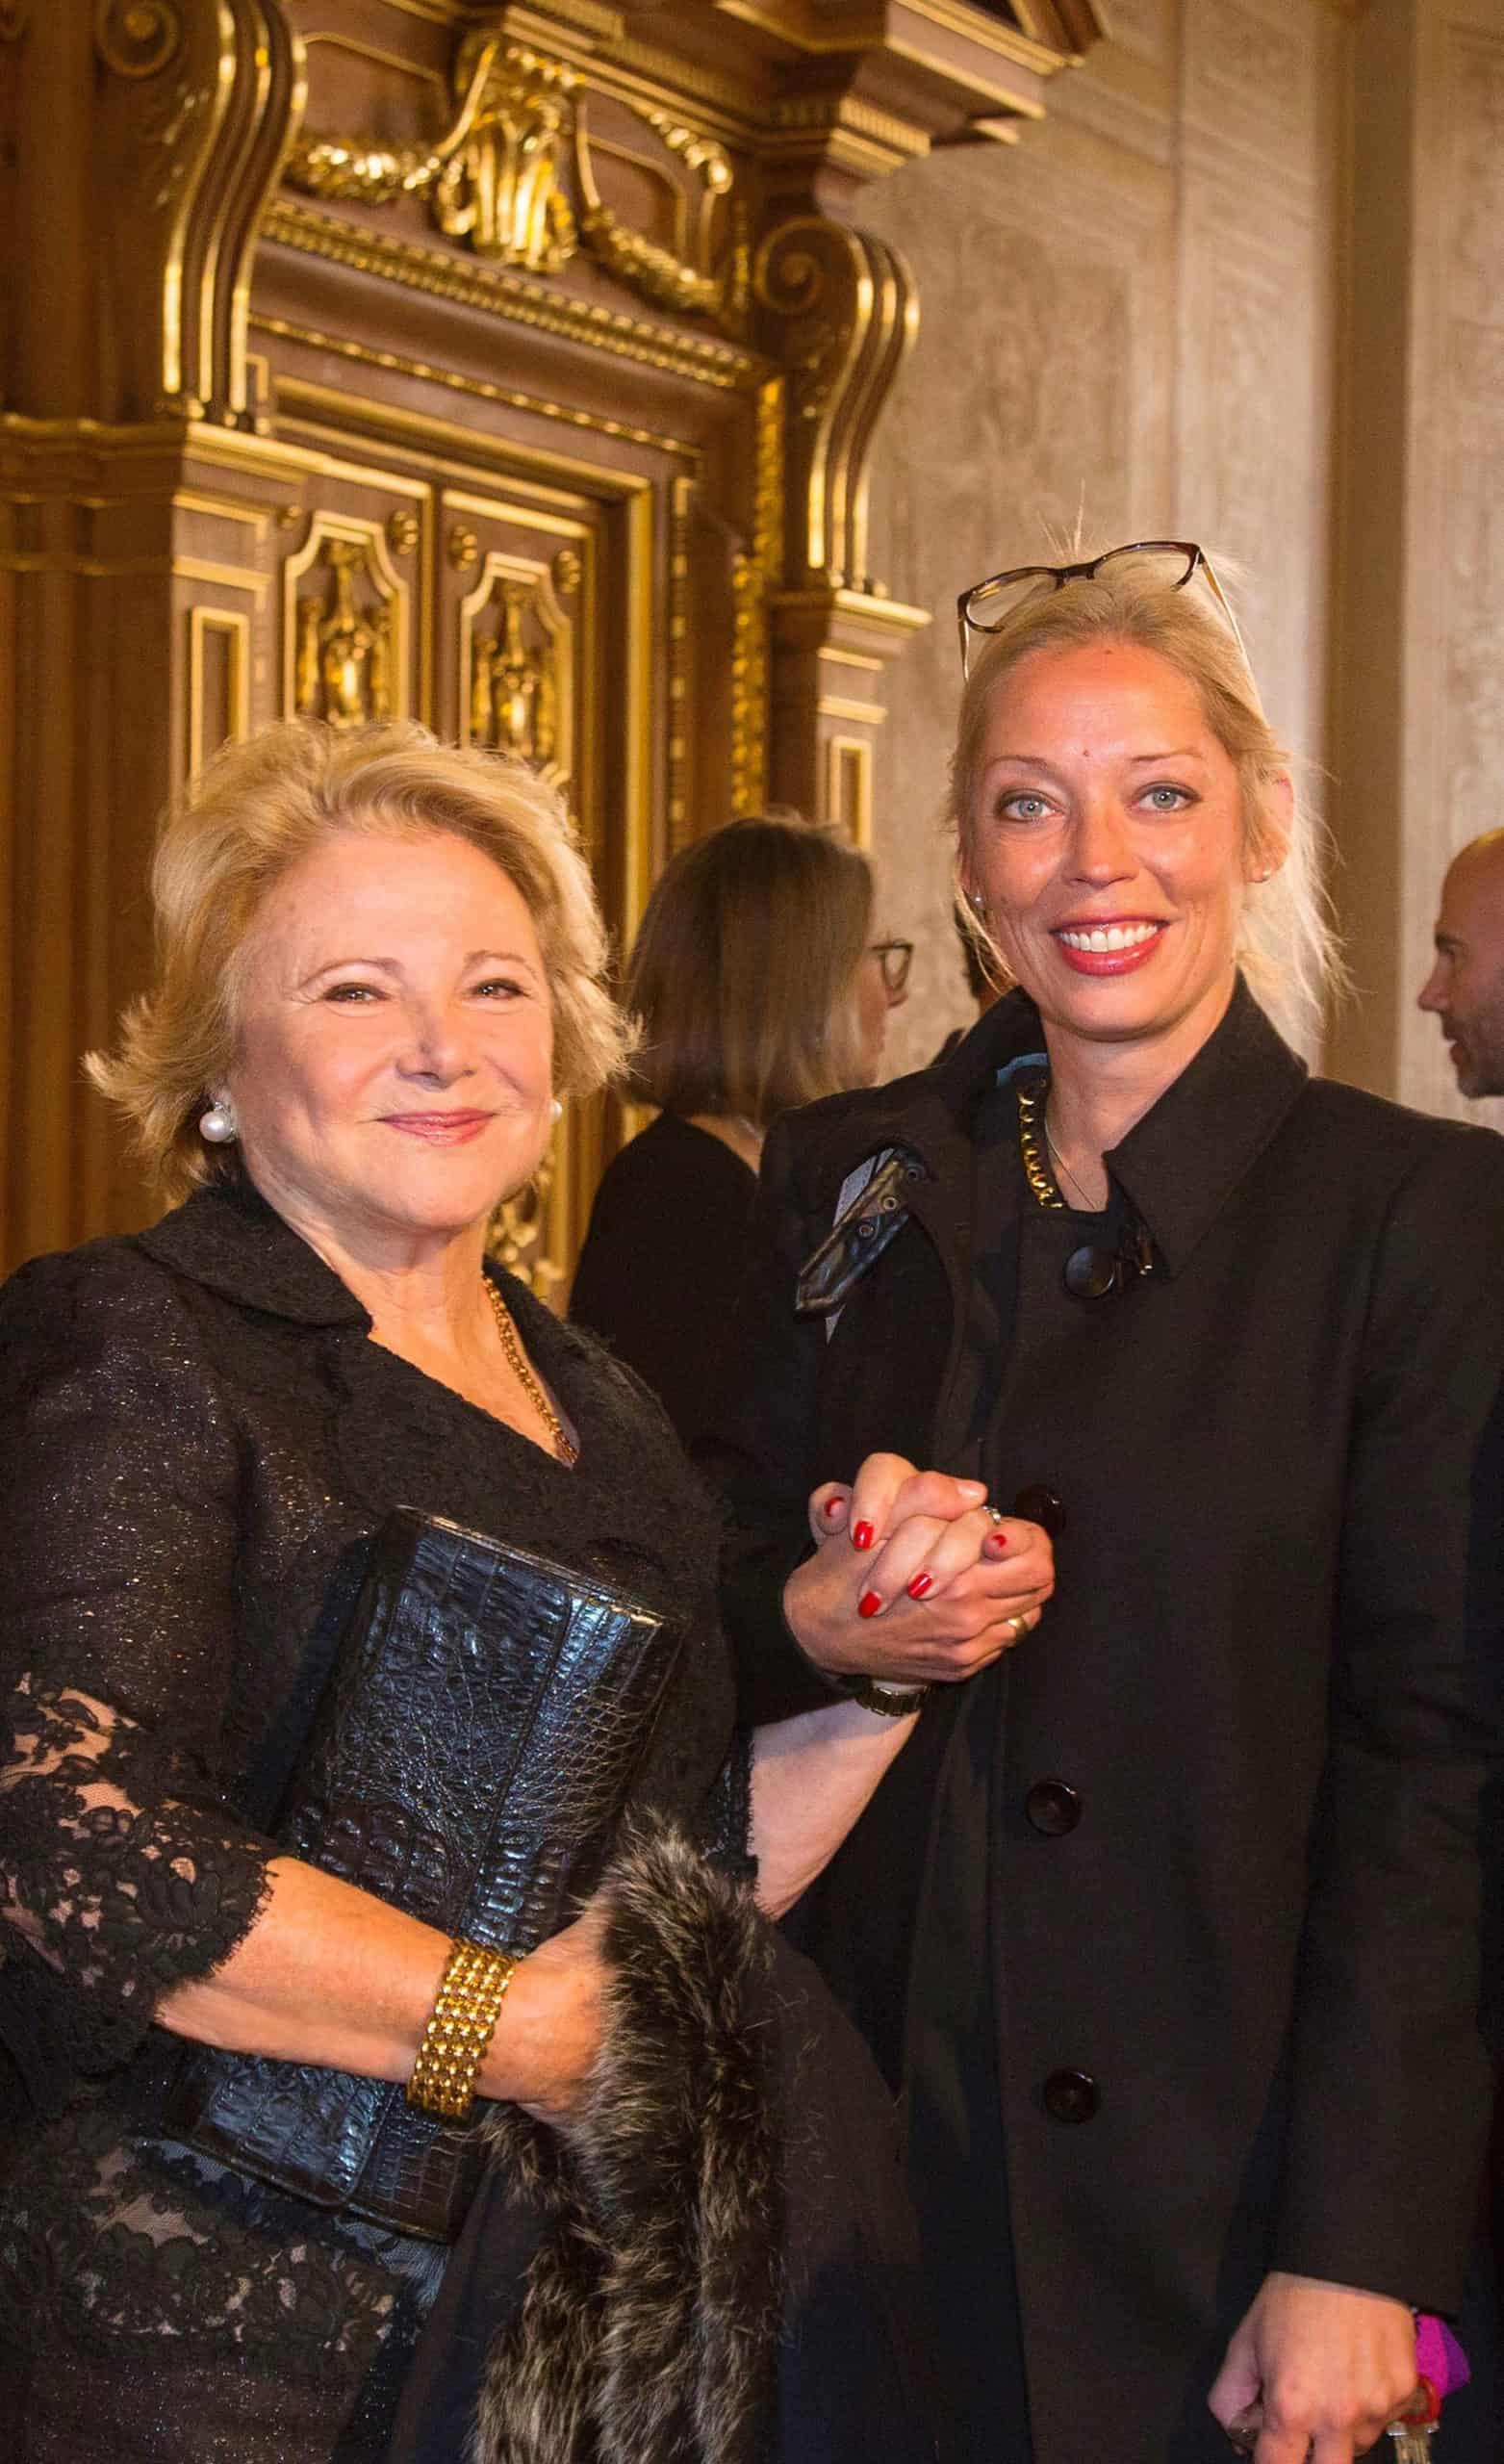 Hon. Mary Mochary and Dr. Yvonne Schülke